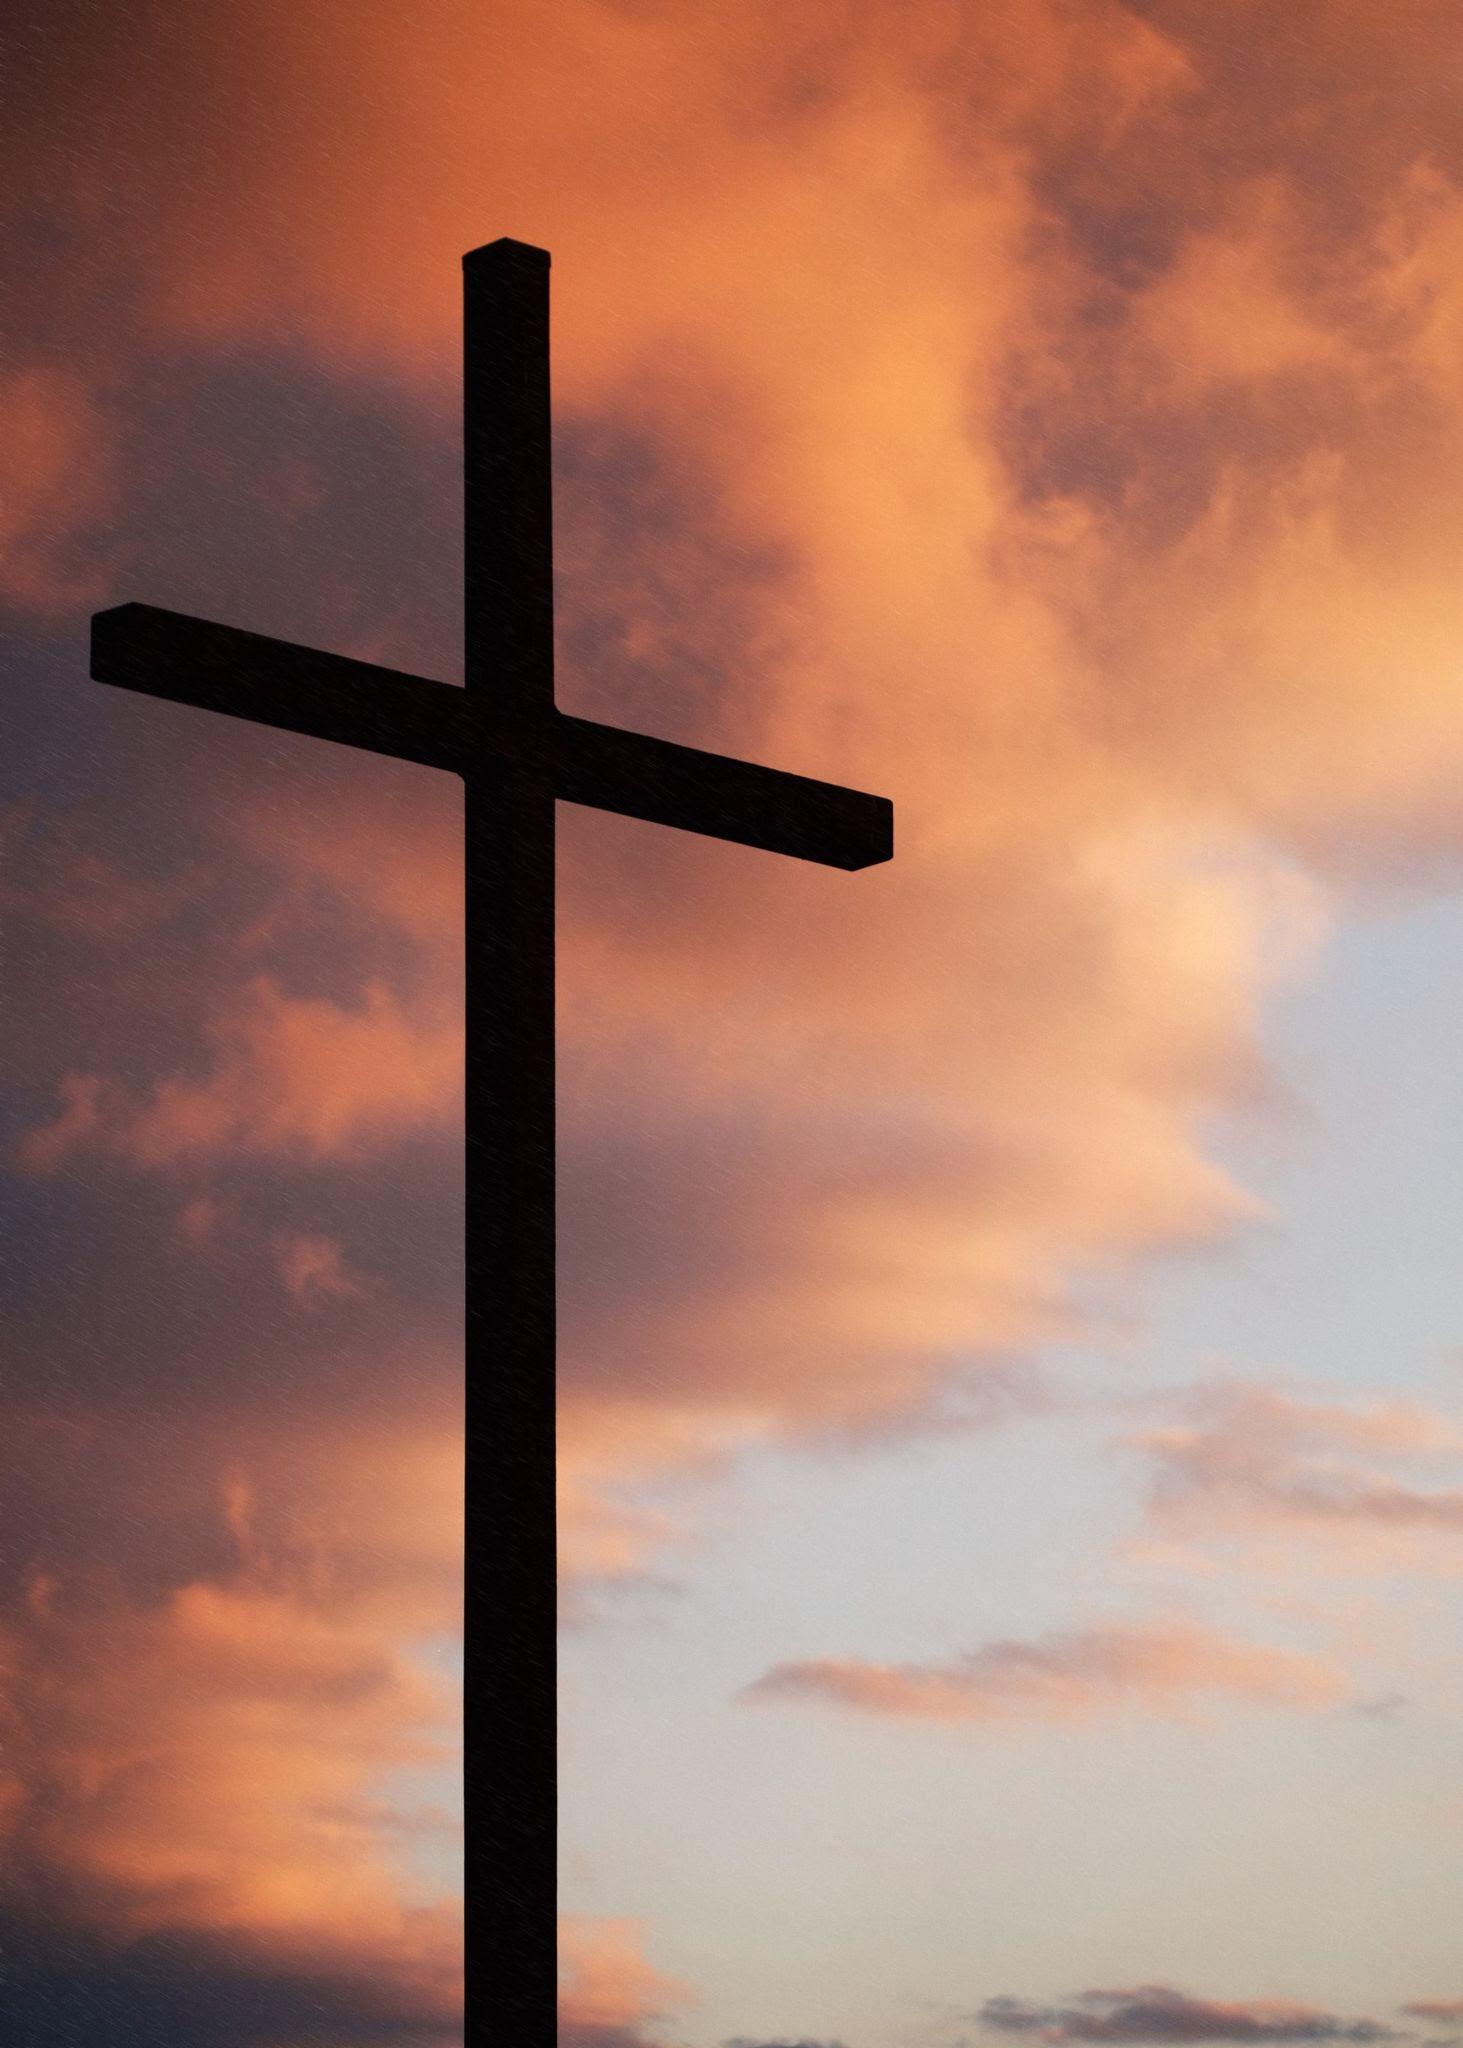 A cross against the morning sky